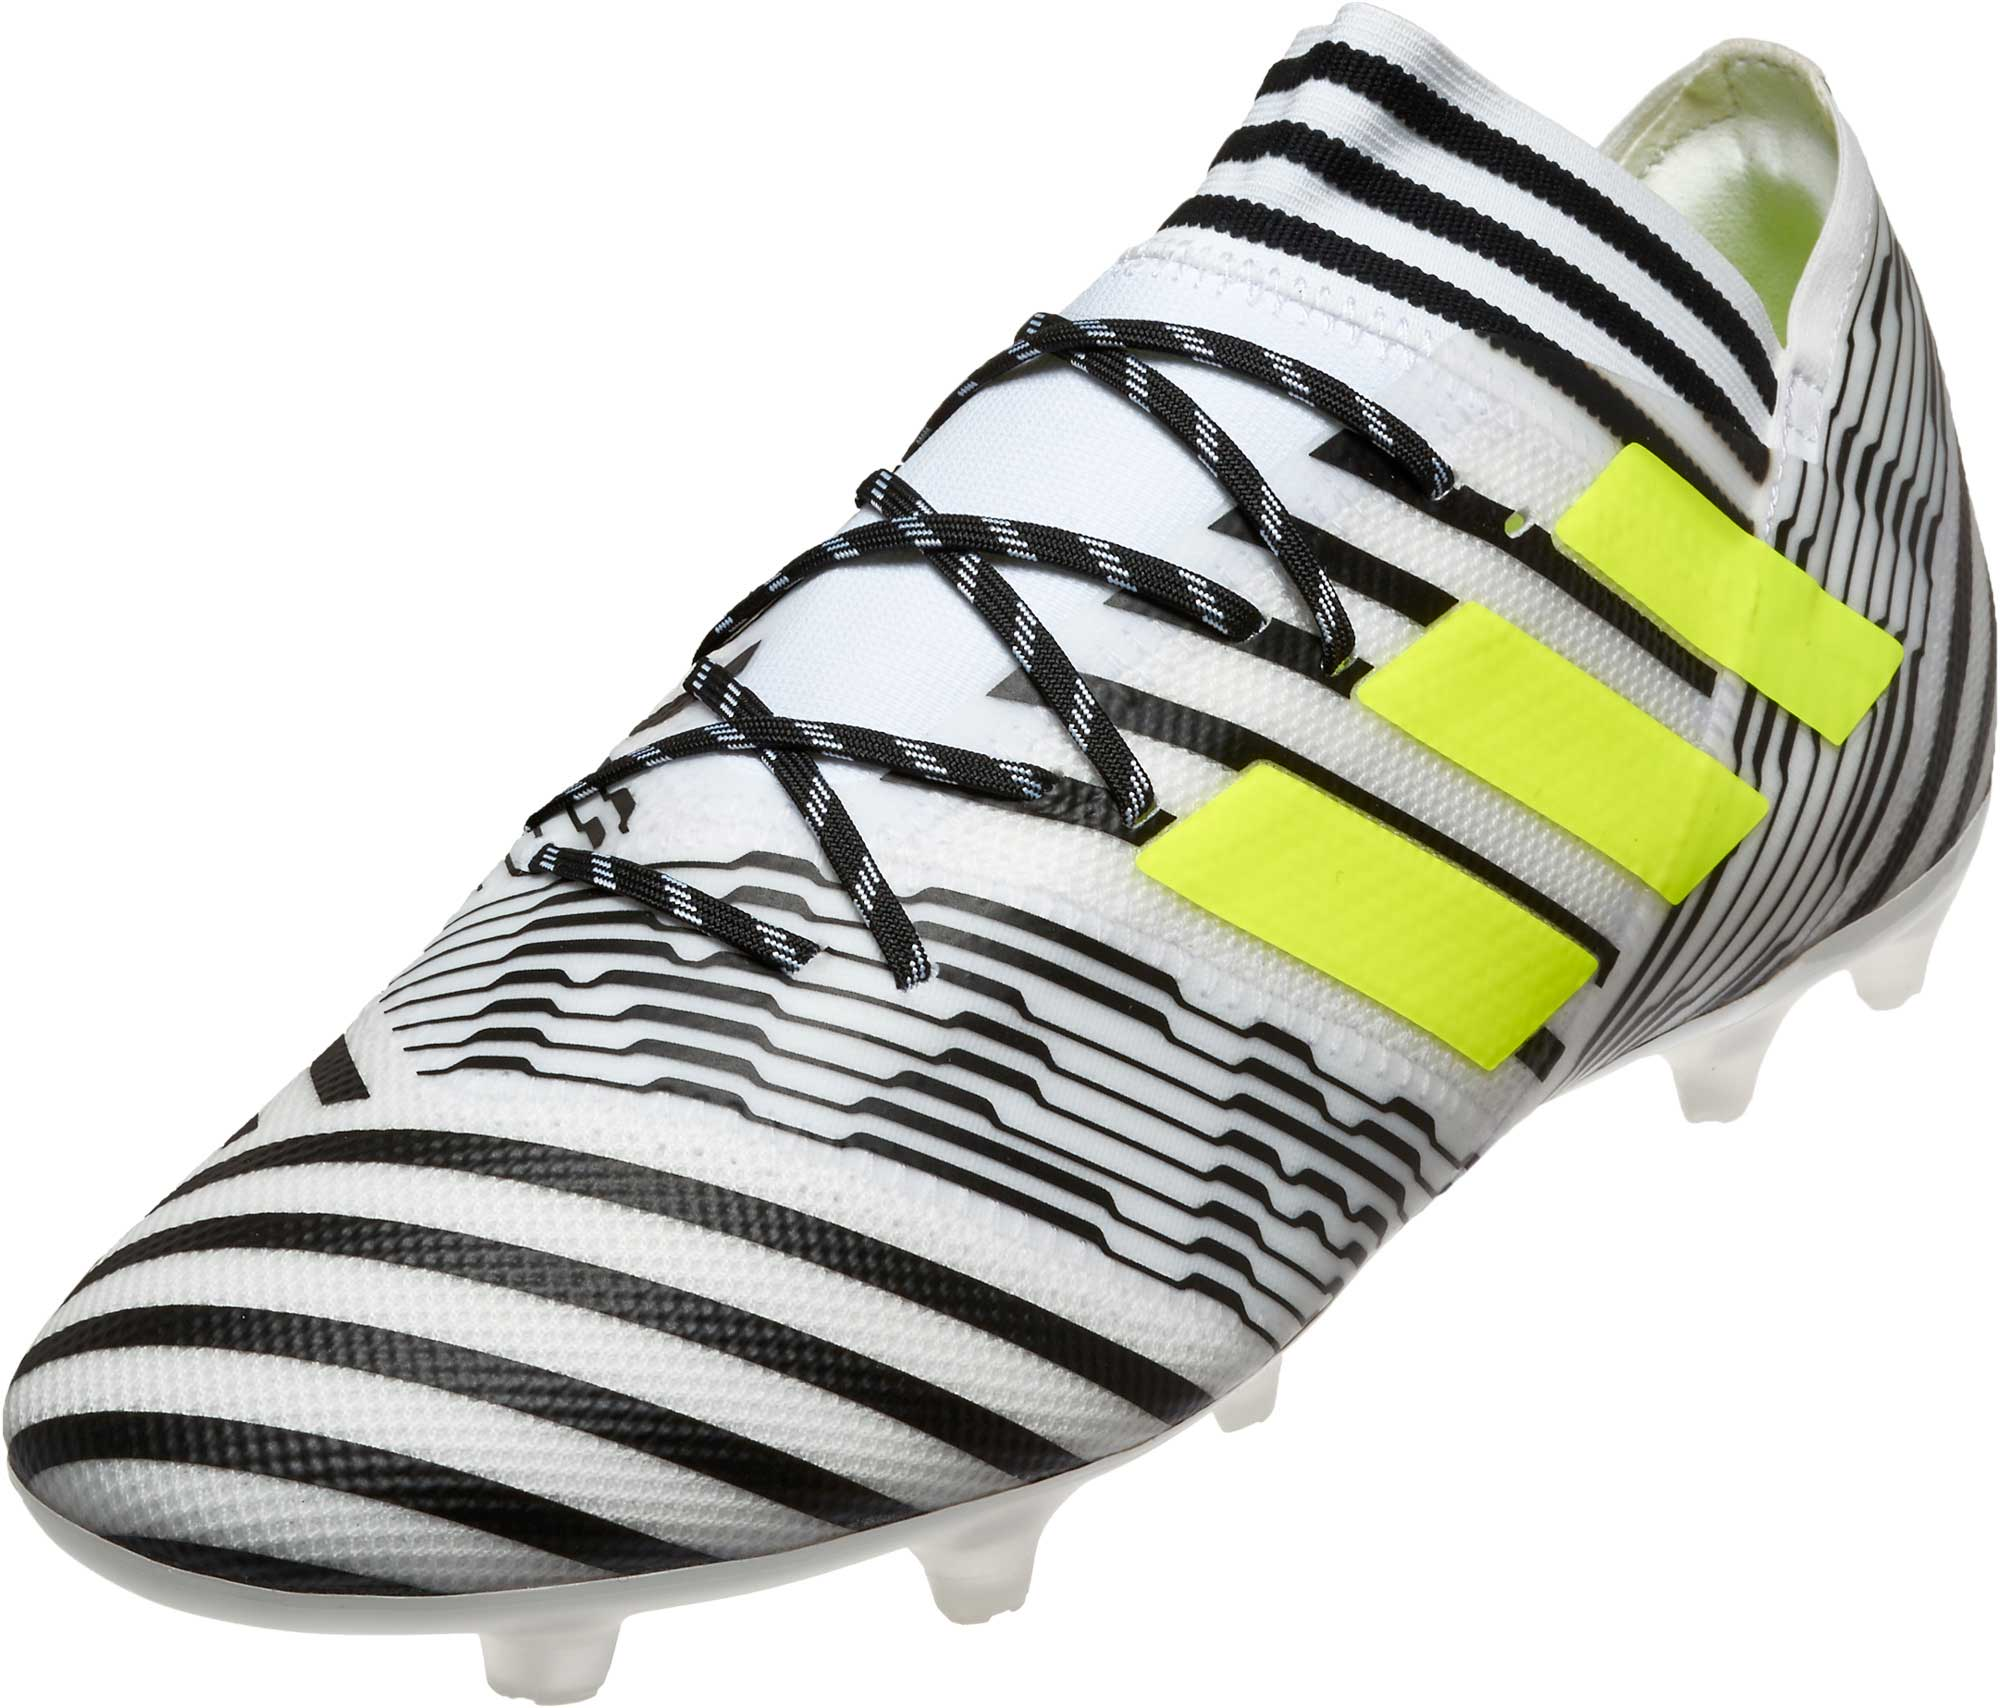 6aeaa55b1286 adidas Nemeziz 17.2 FG Soccer Cleats - White   Solar Yellow ...